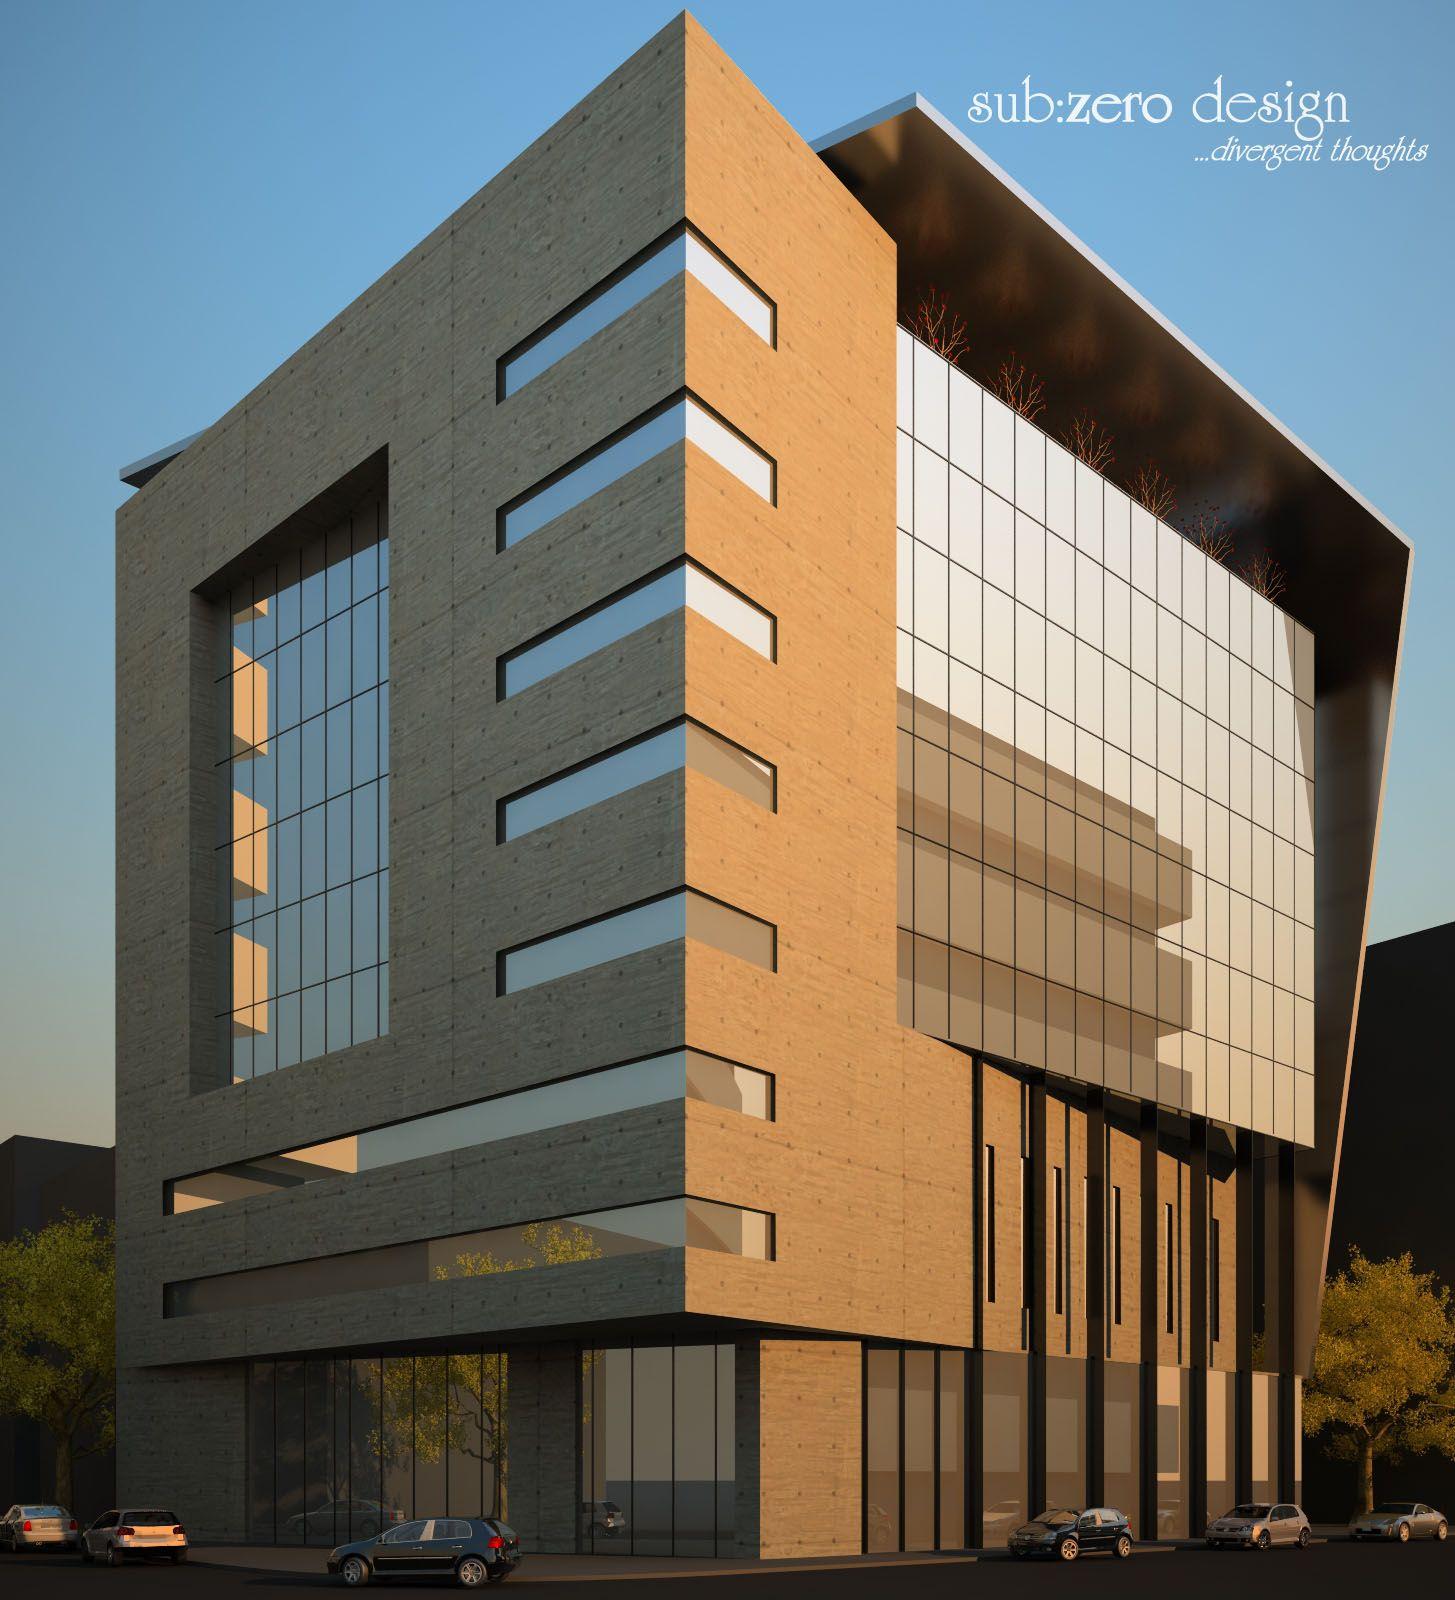 office building design concepts. Concepts For An Office Building Design. Which One Do You Like Best? Design R